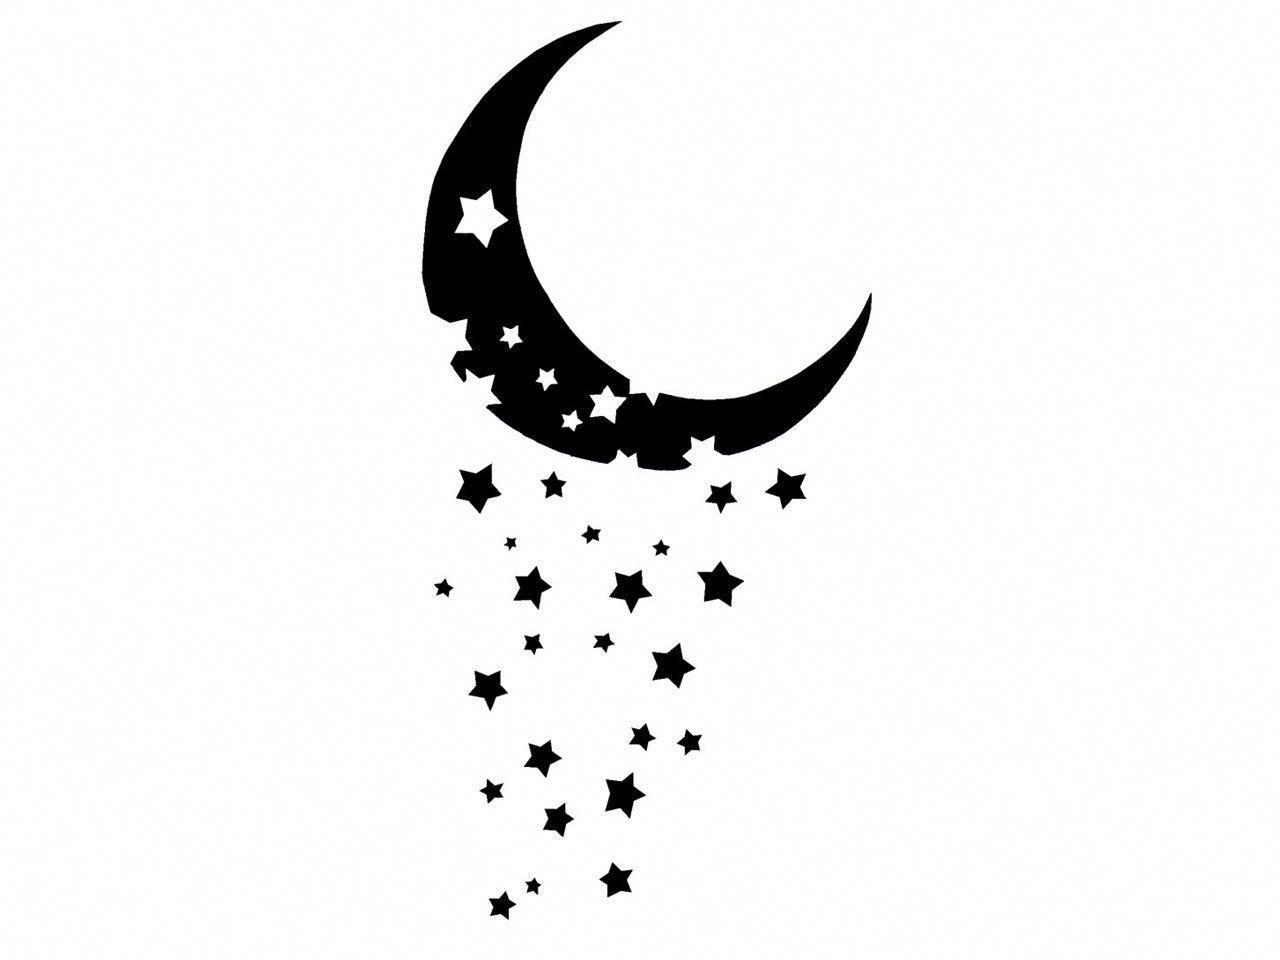 Crescent Moon Designs Google Search Legtattoos Star Tattoos Star Tattoo Designs Moon Tattoo Designs